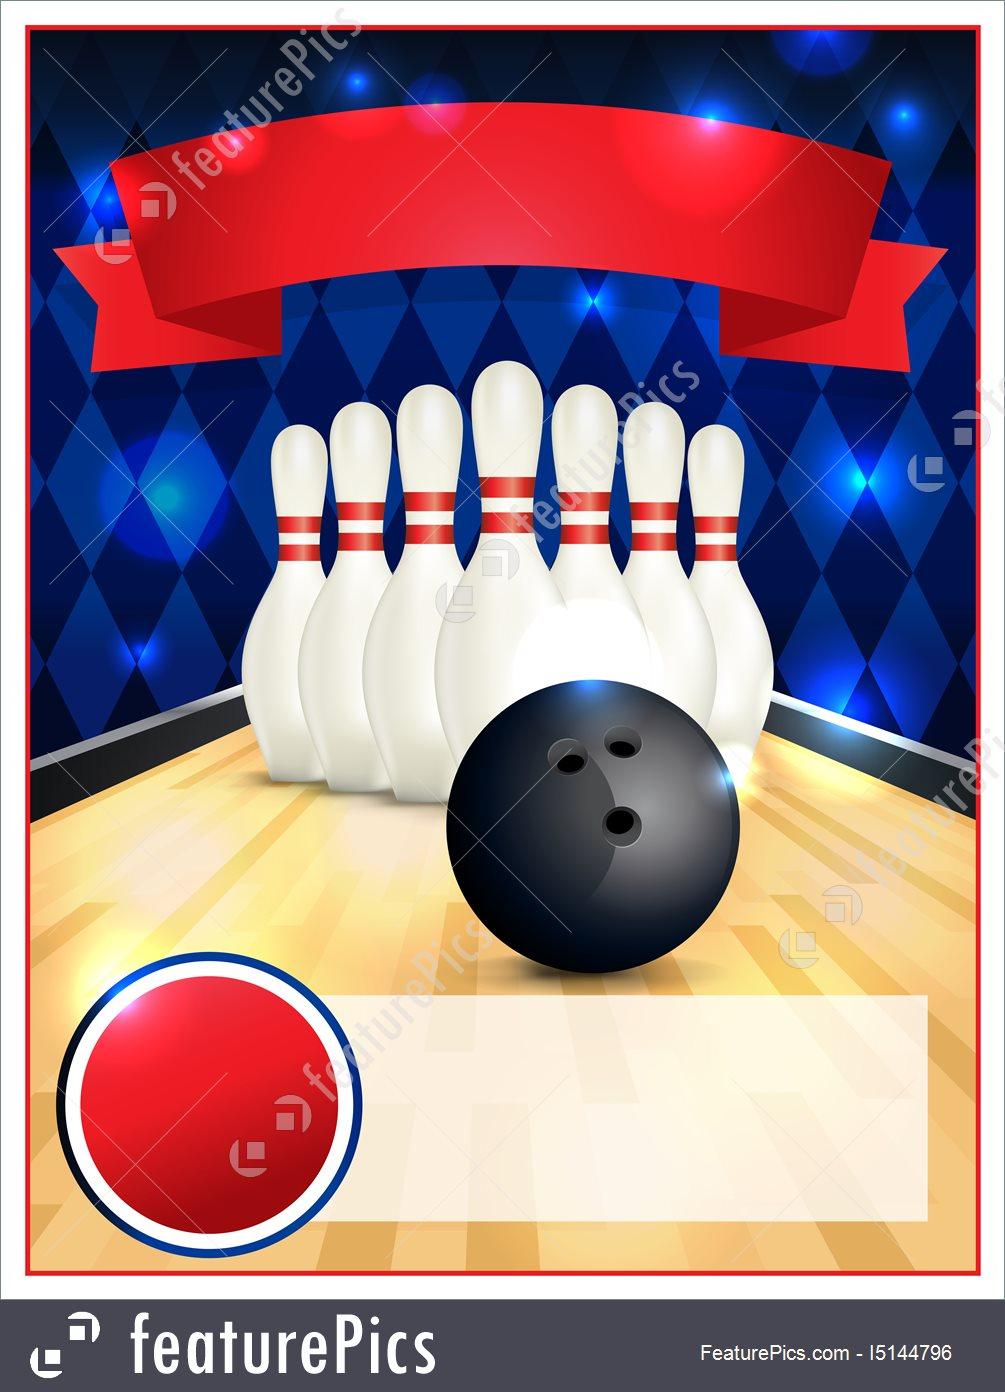 Bowling Party Invitation Template | Hunecompany - Free Printable Bowling Invitation Templates